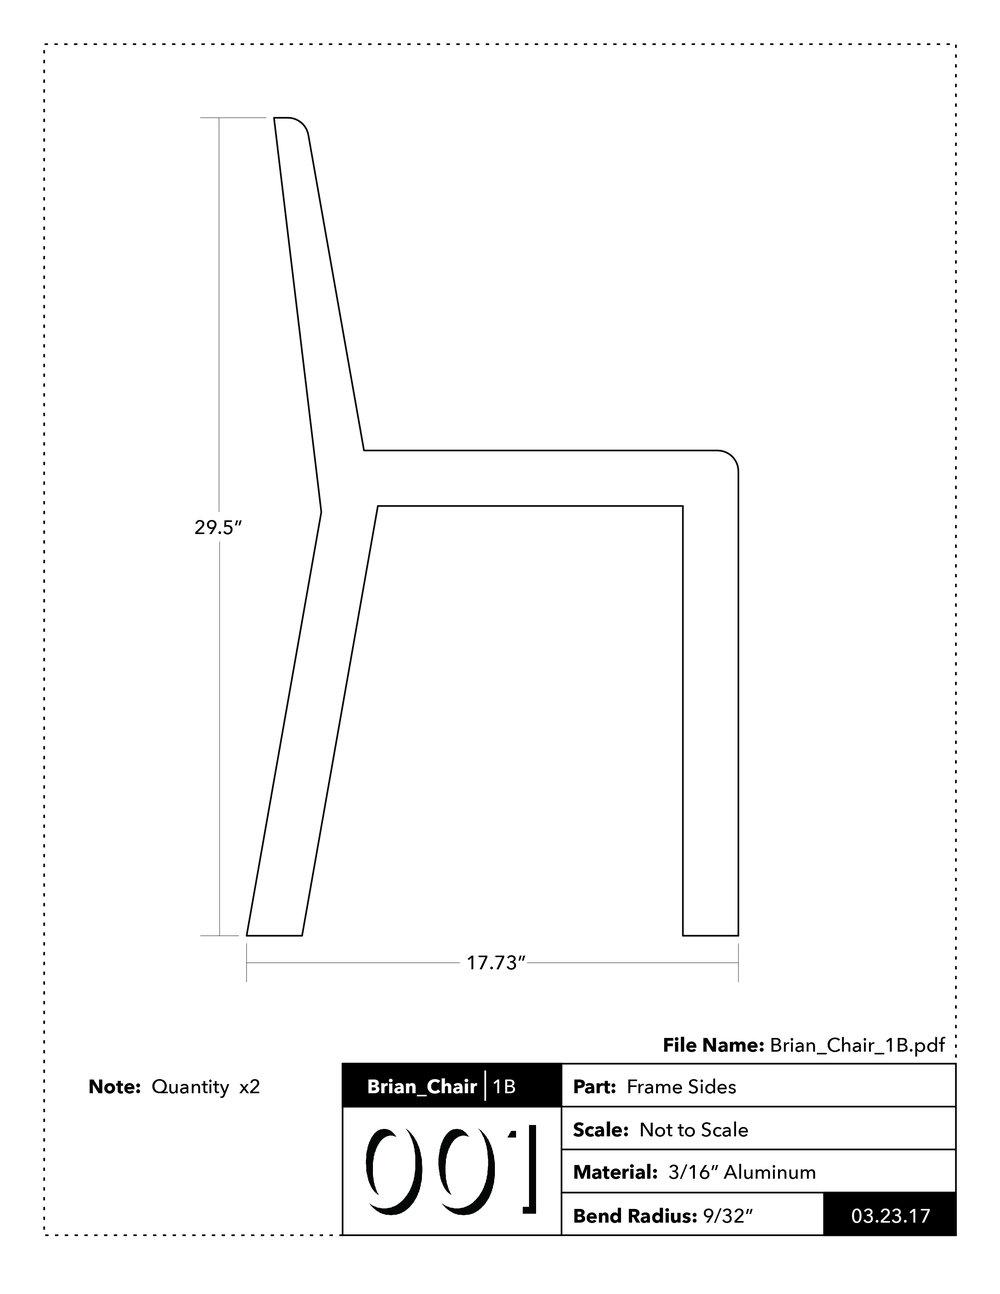 Kovesci_Chair_BendInstructions-02.jpg